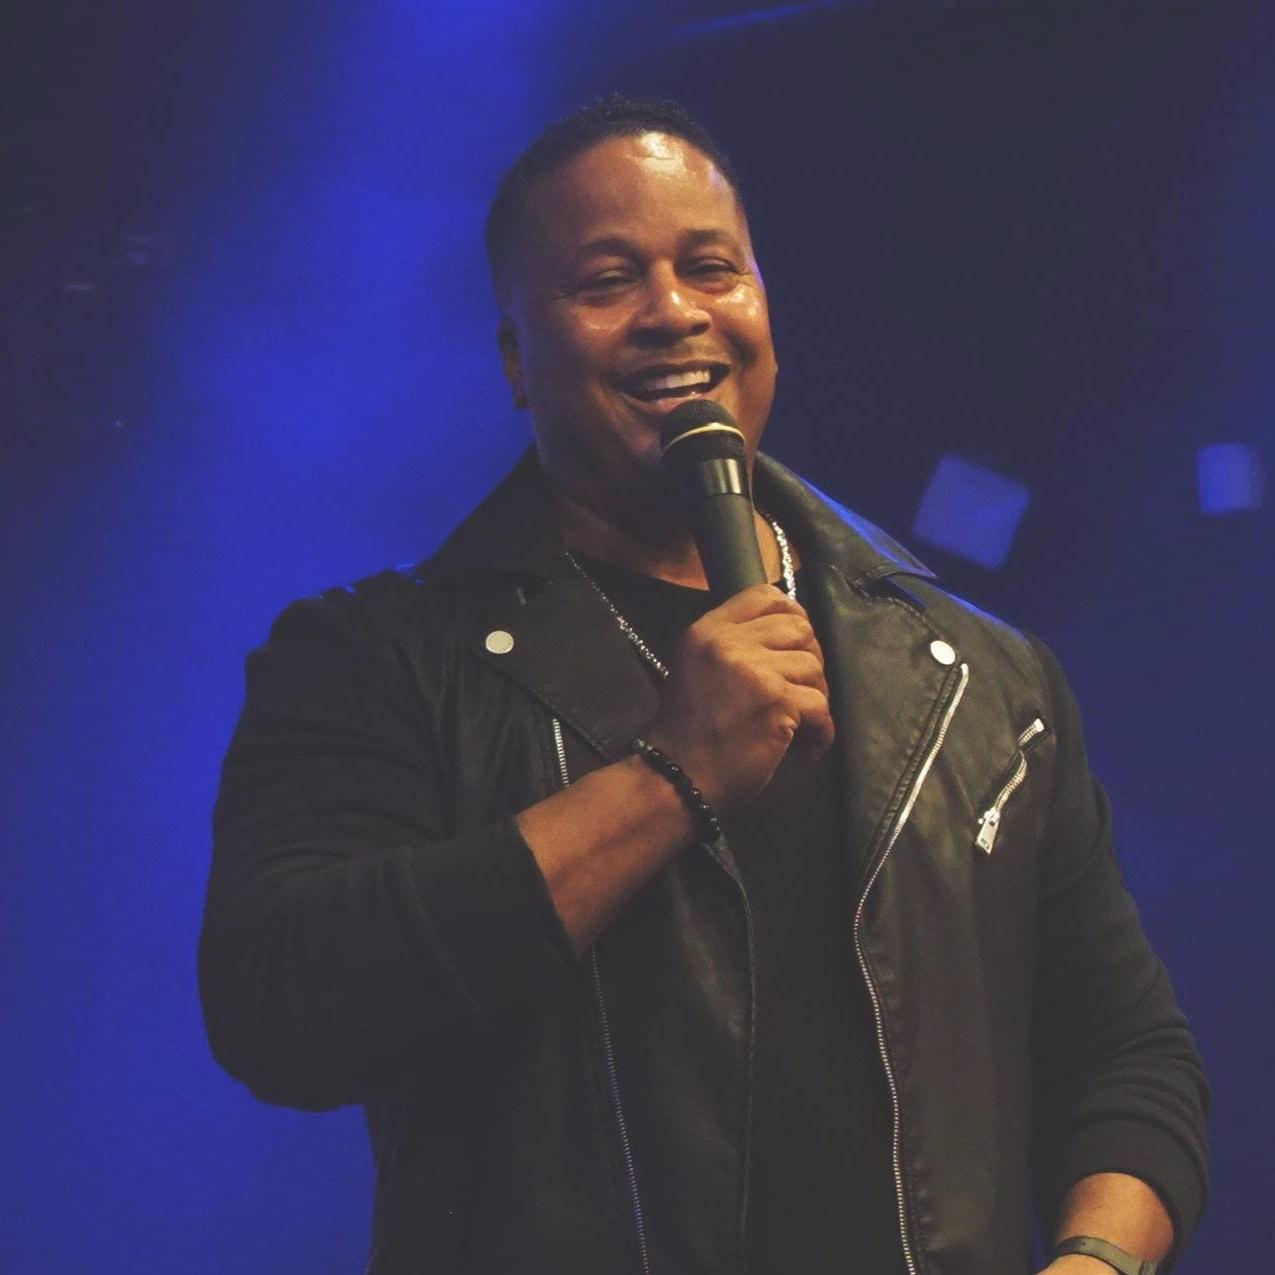 Pastor Patrick Ligon - Senior Pastor